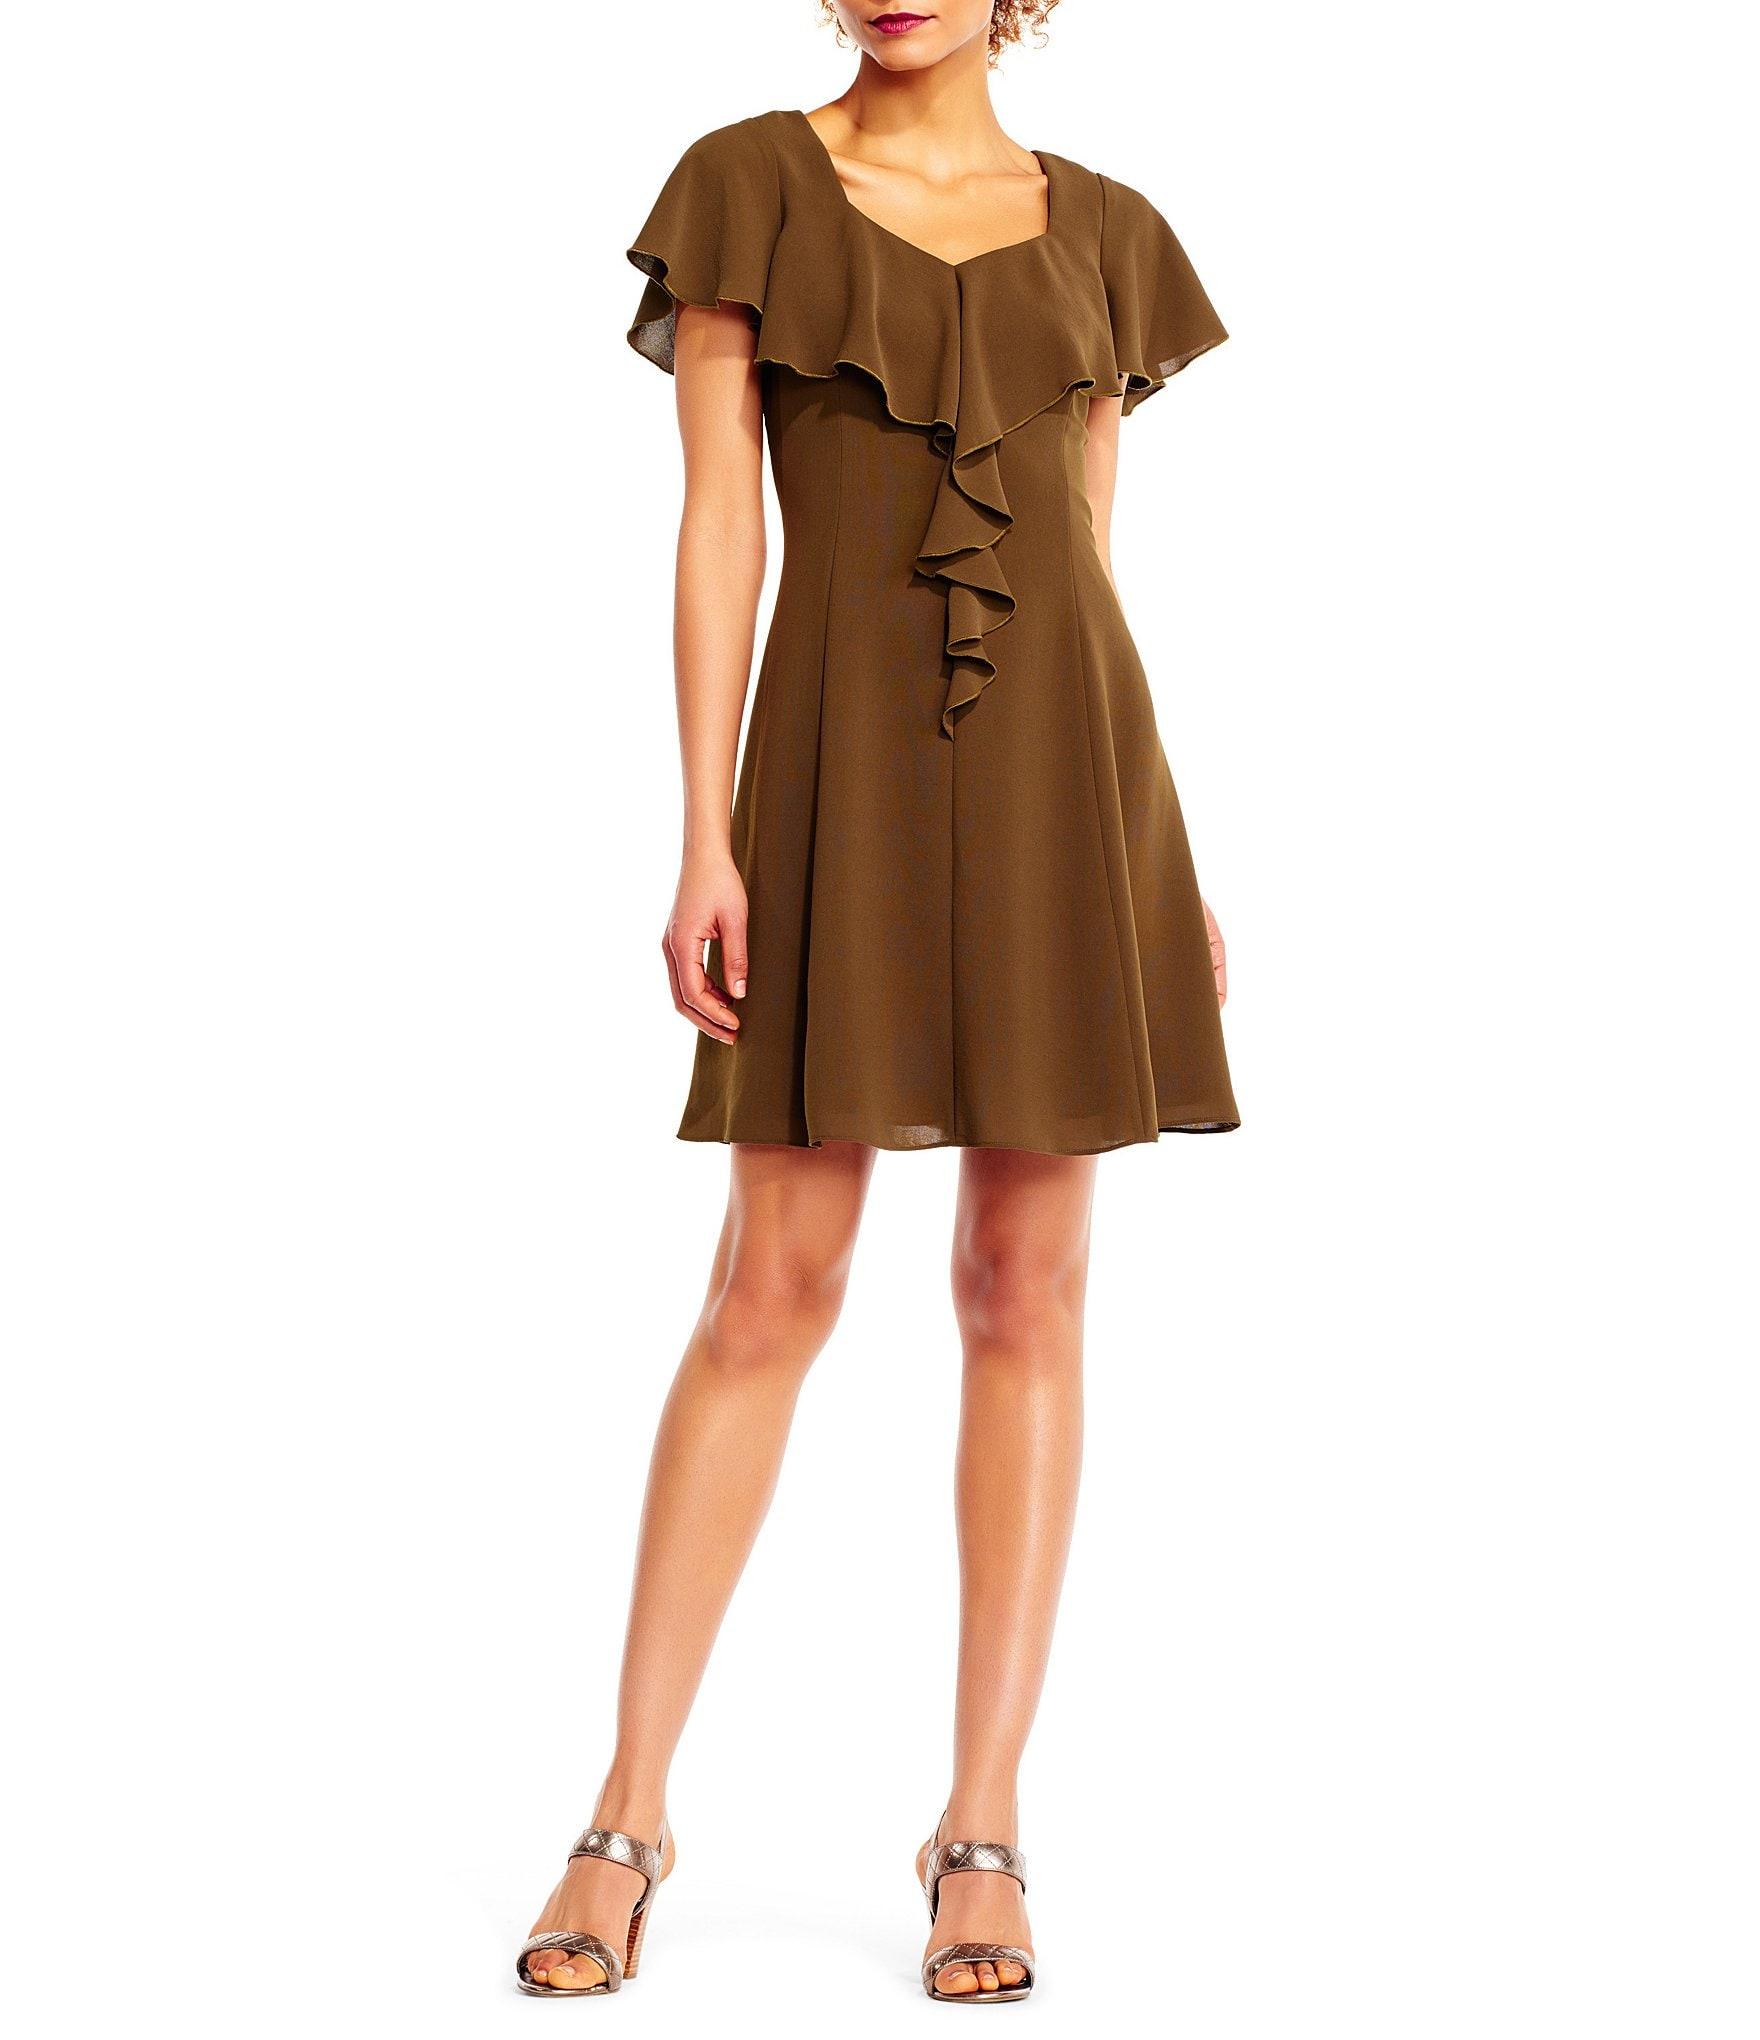 Women\'s Cap-Sleeve Cocktail Dresses | Dillards